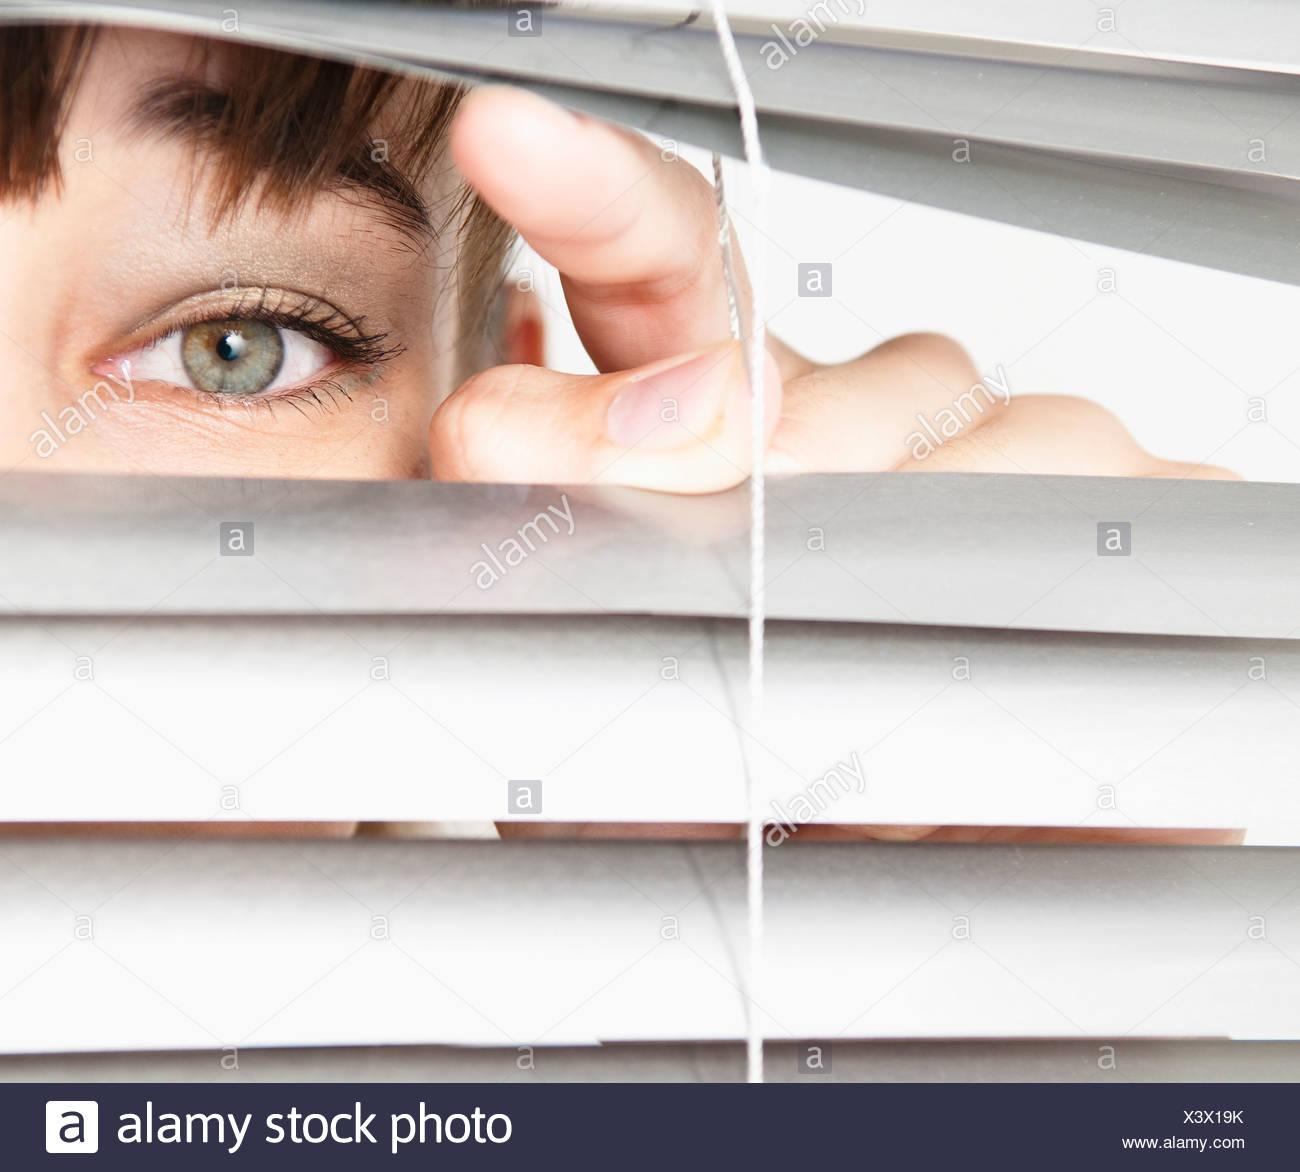 Woman peeking through blinds - Stock Image